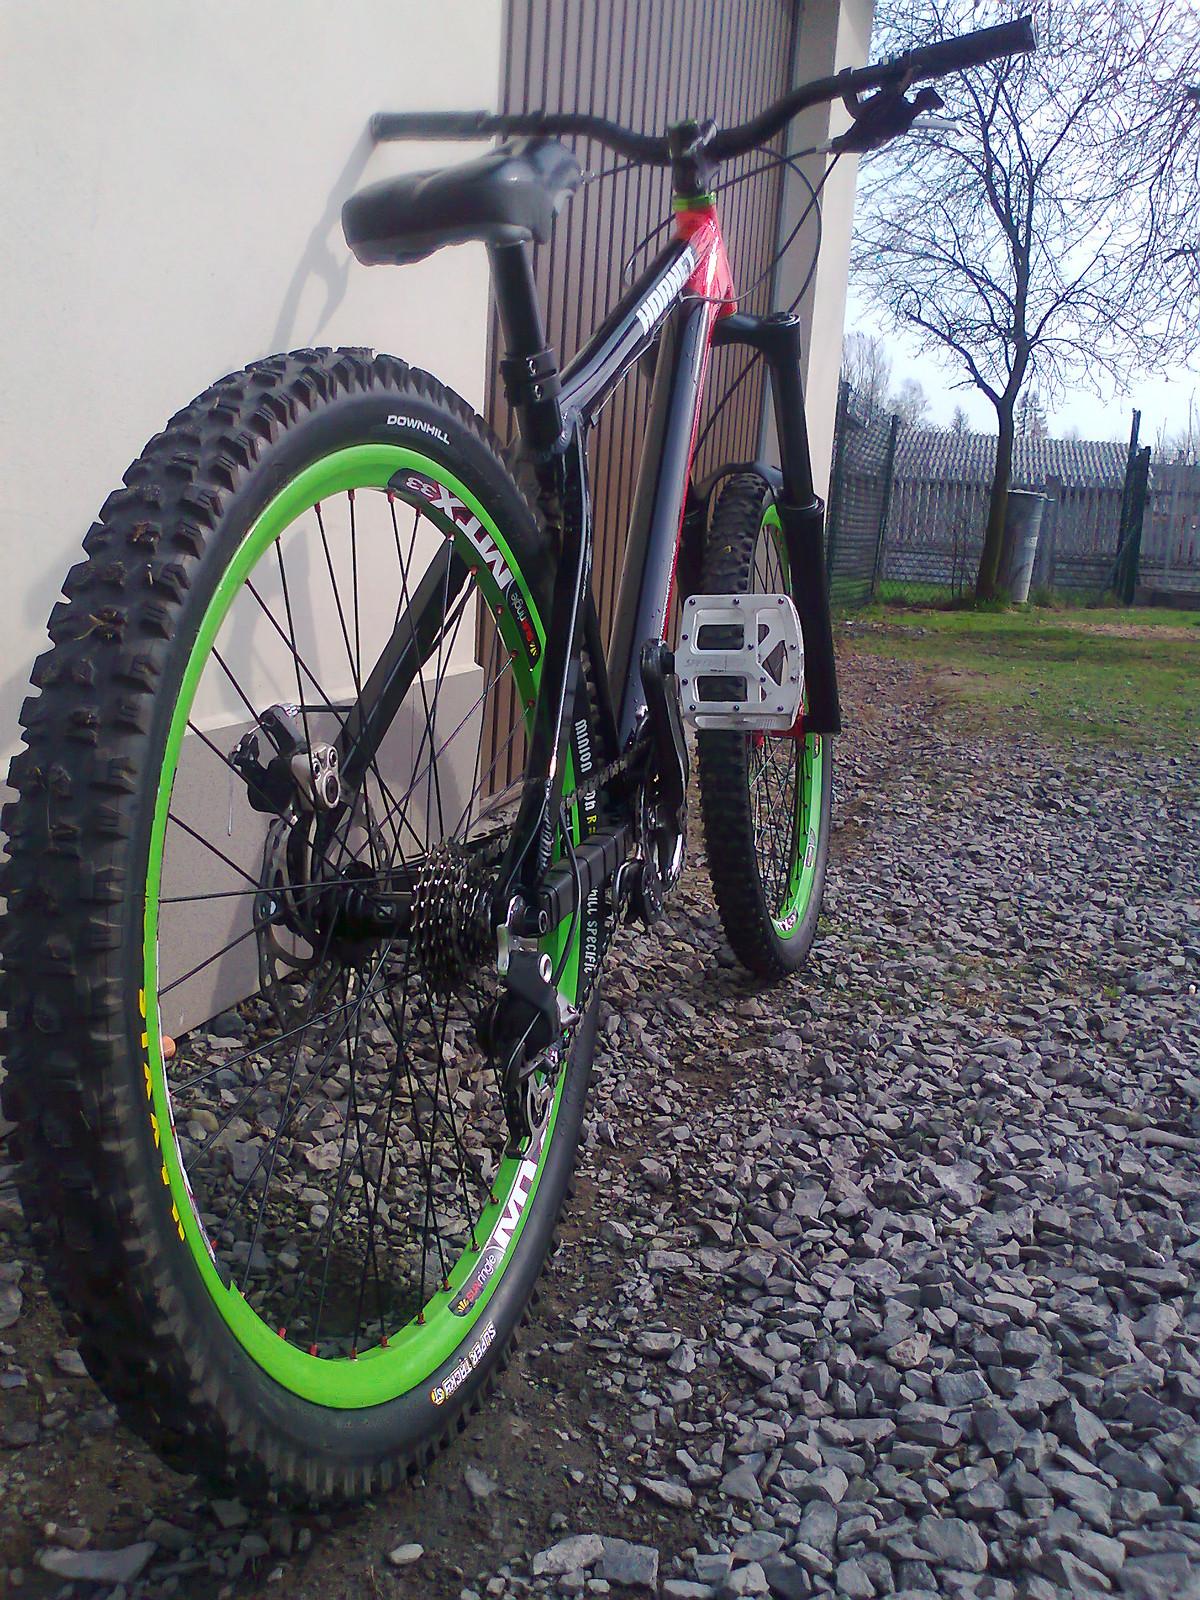 My new bike on a Dartmoor HORNET frame :D